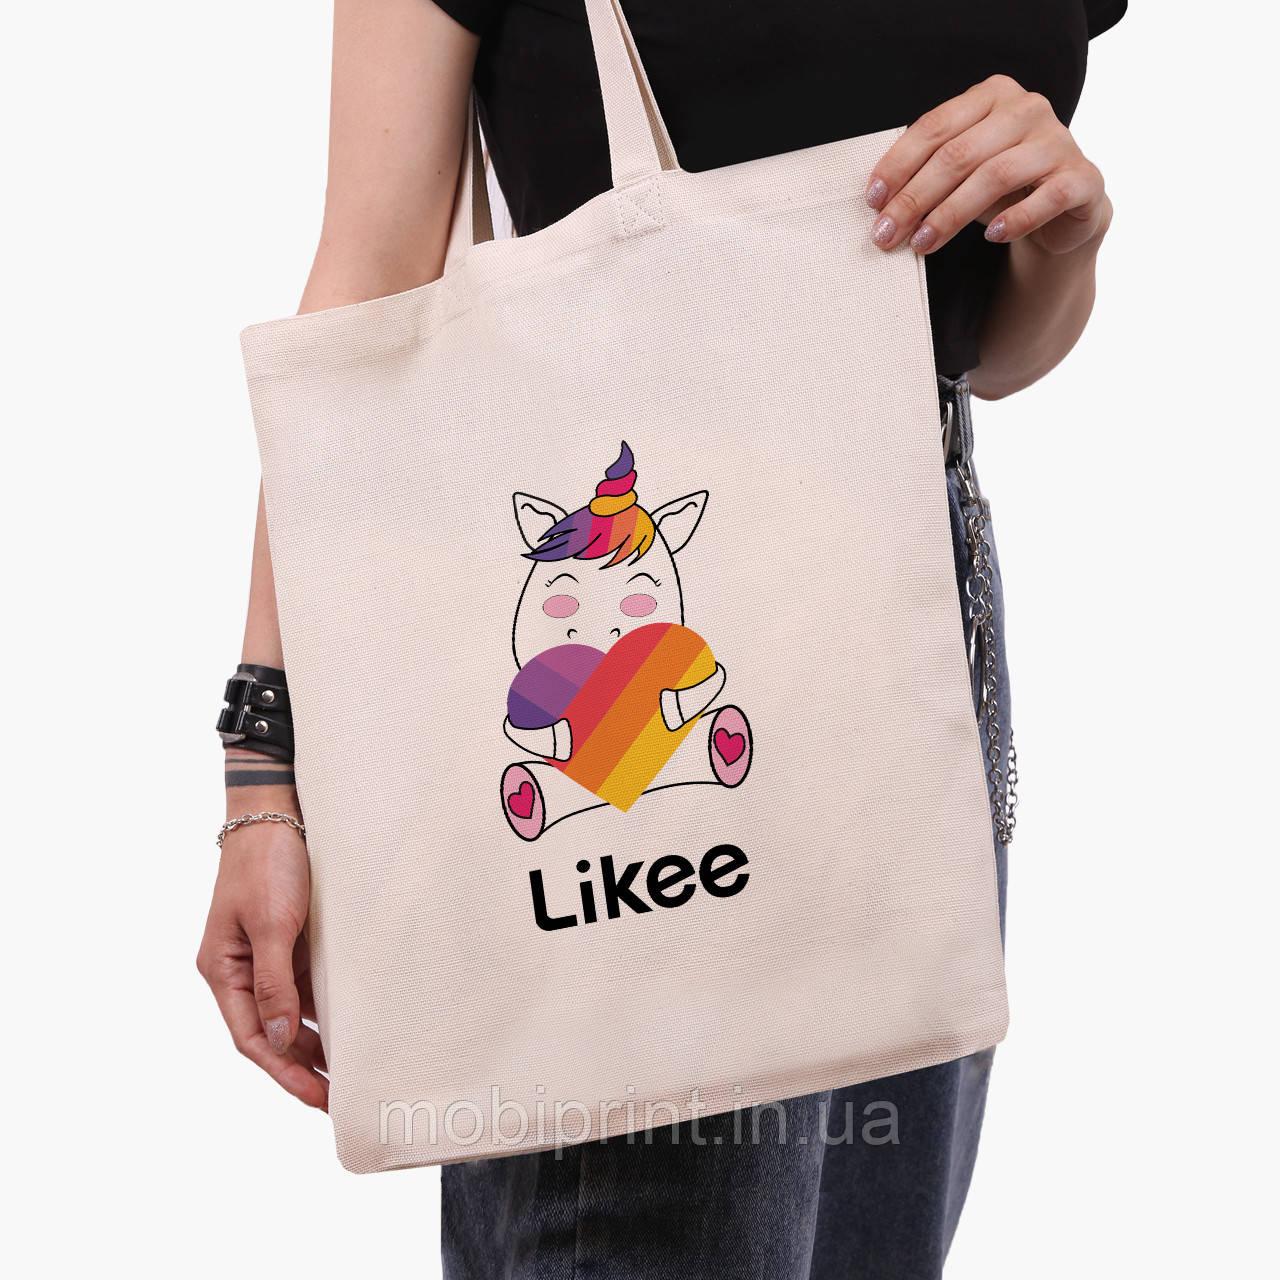 Эко сумка шоппер Лайк Единорог (Likee Unicorn) (9227-1037)  экосумка шопер 41*35 см